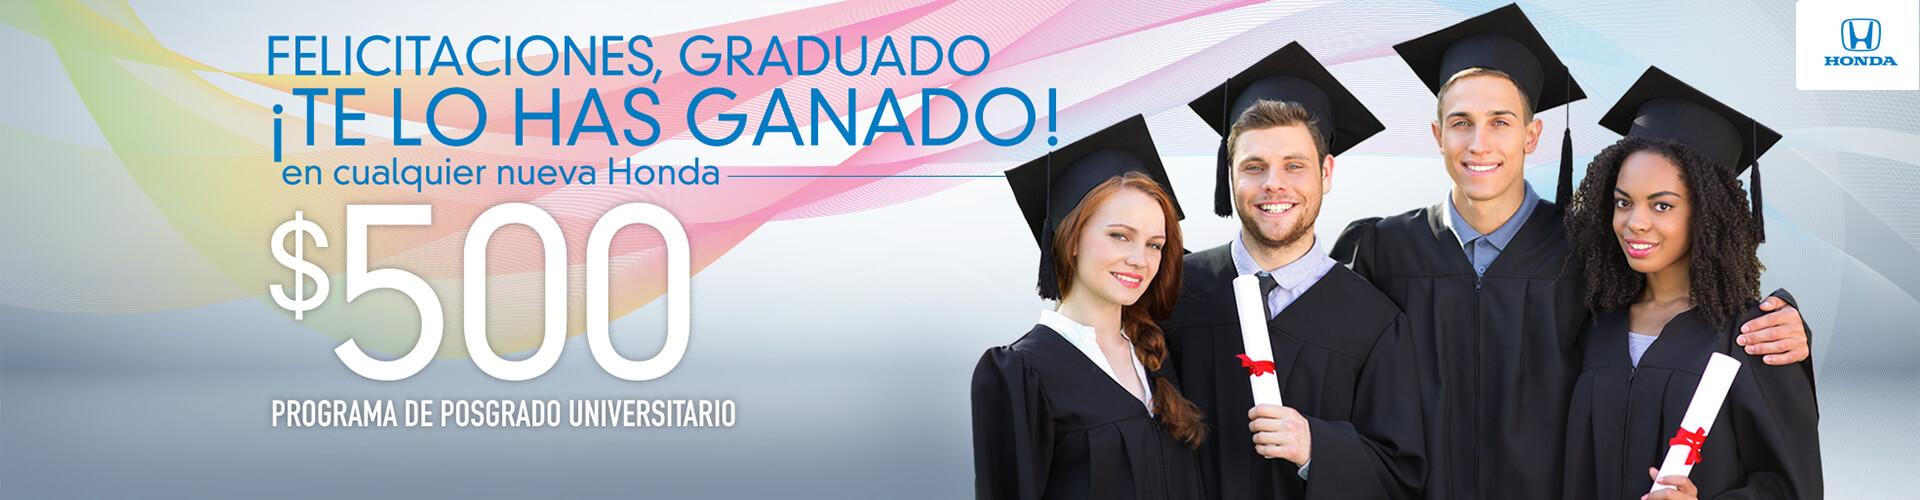 Oferta para Graduados